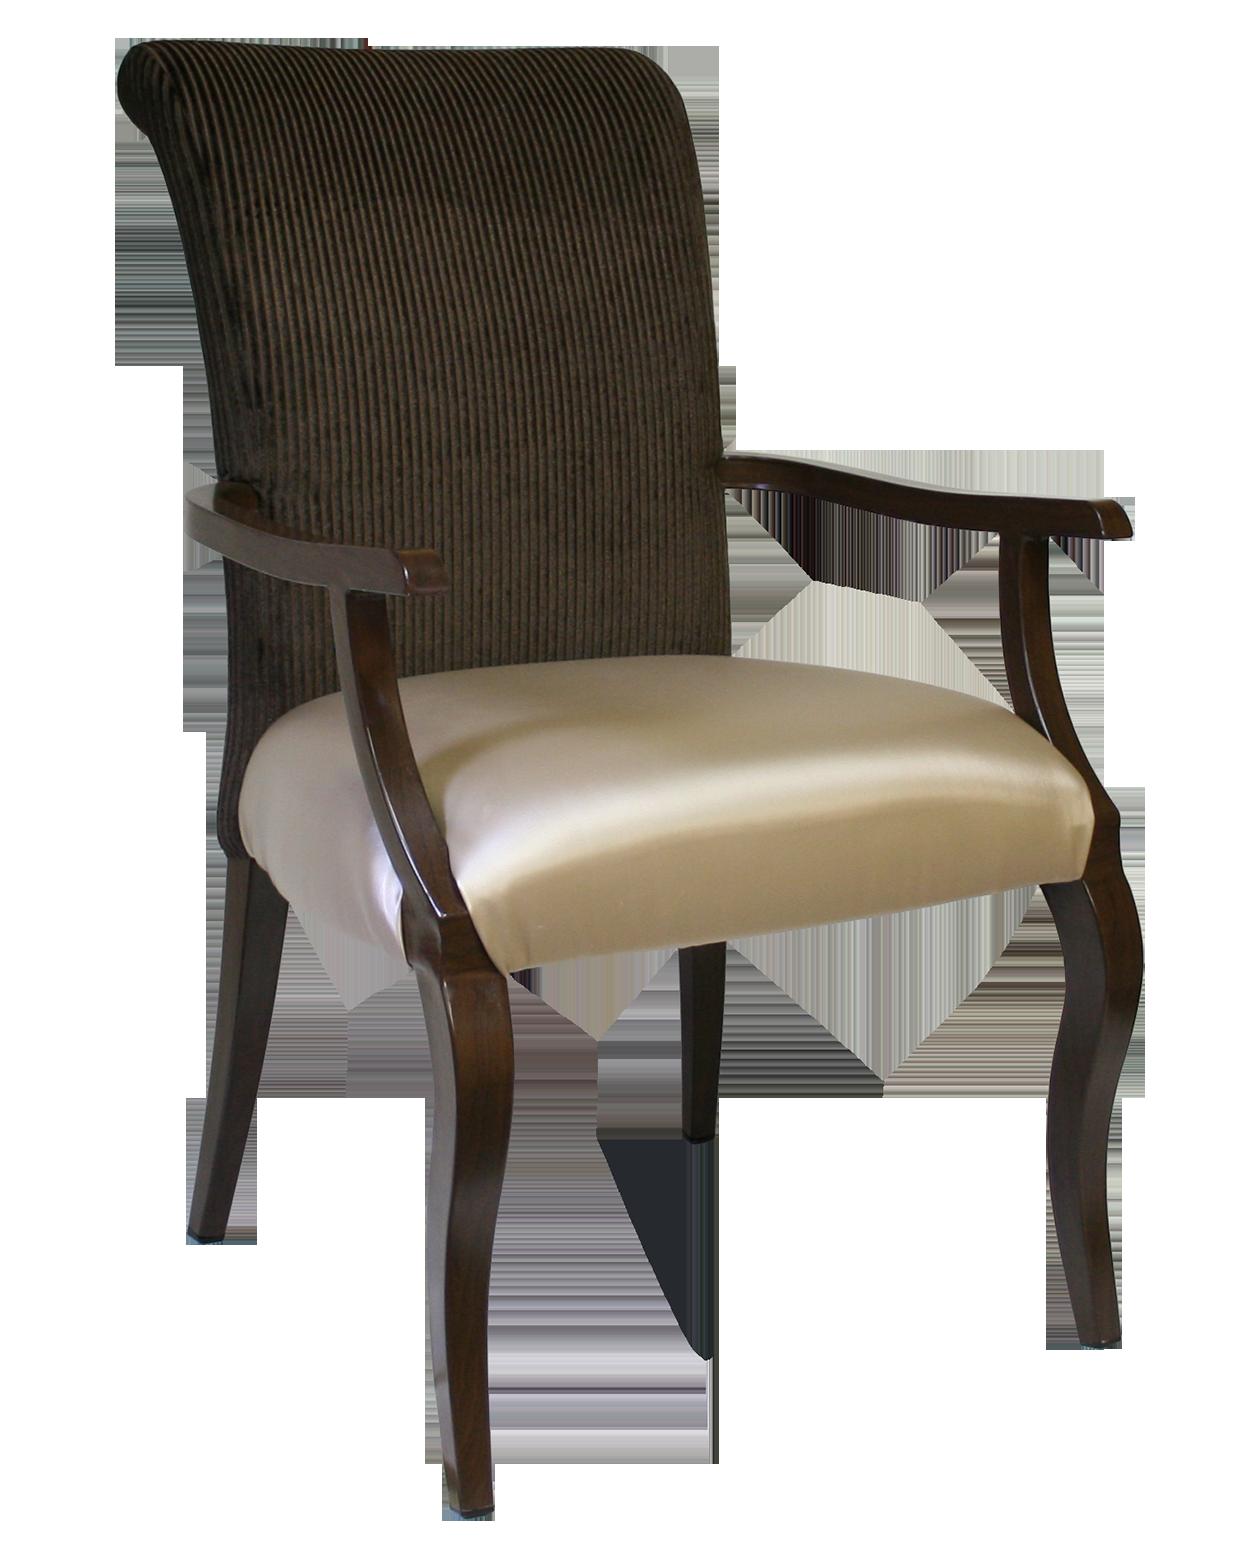 Washington Ii Duracare Seating Company